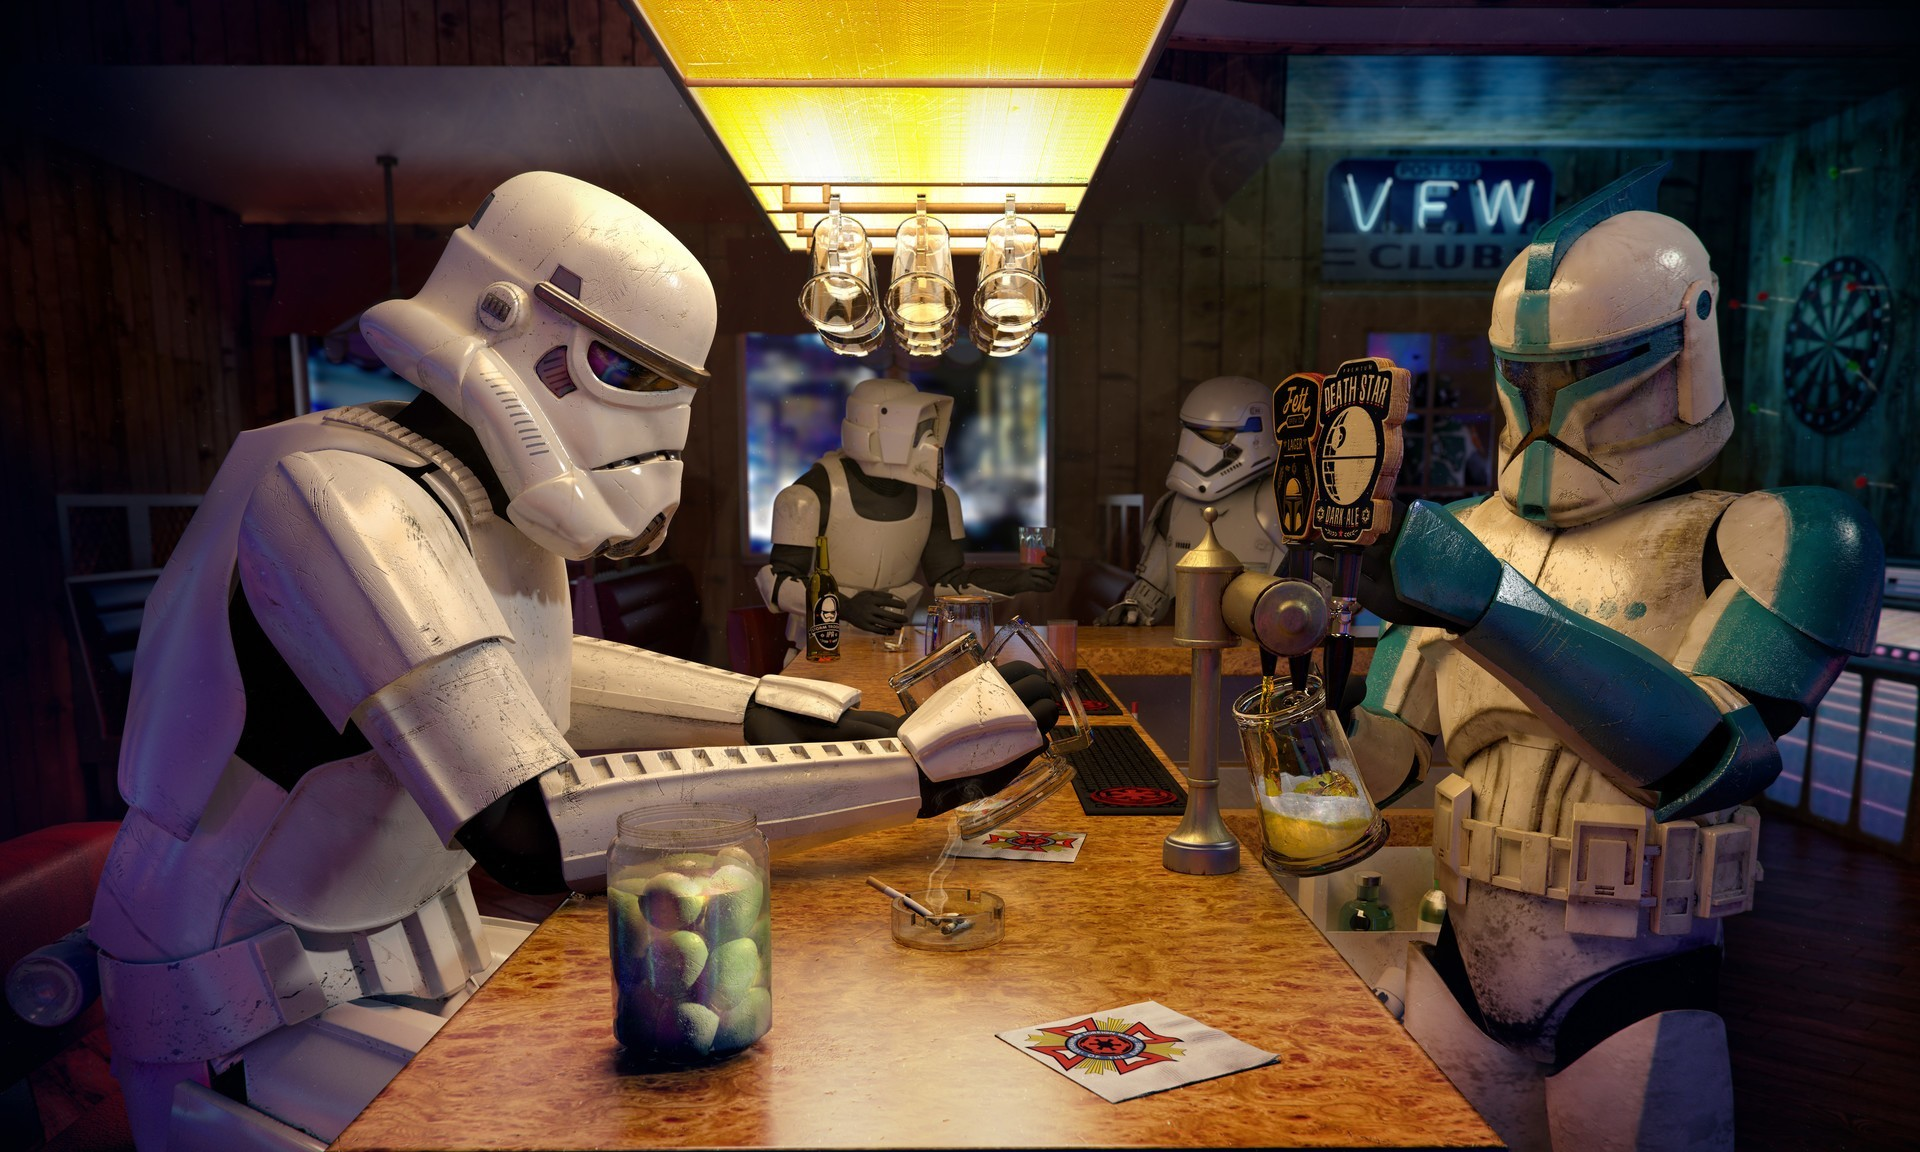 stormtrooper, Clone Trooper, Scout Trooper, Bar, Star Wars Wallpapers HD /  Desktop and Mobile Backgrounds